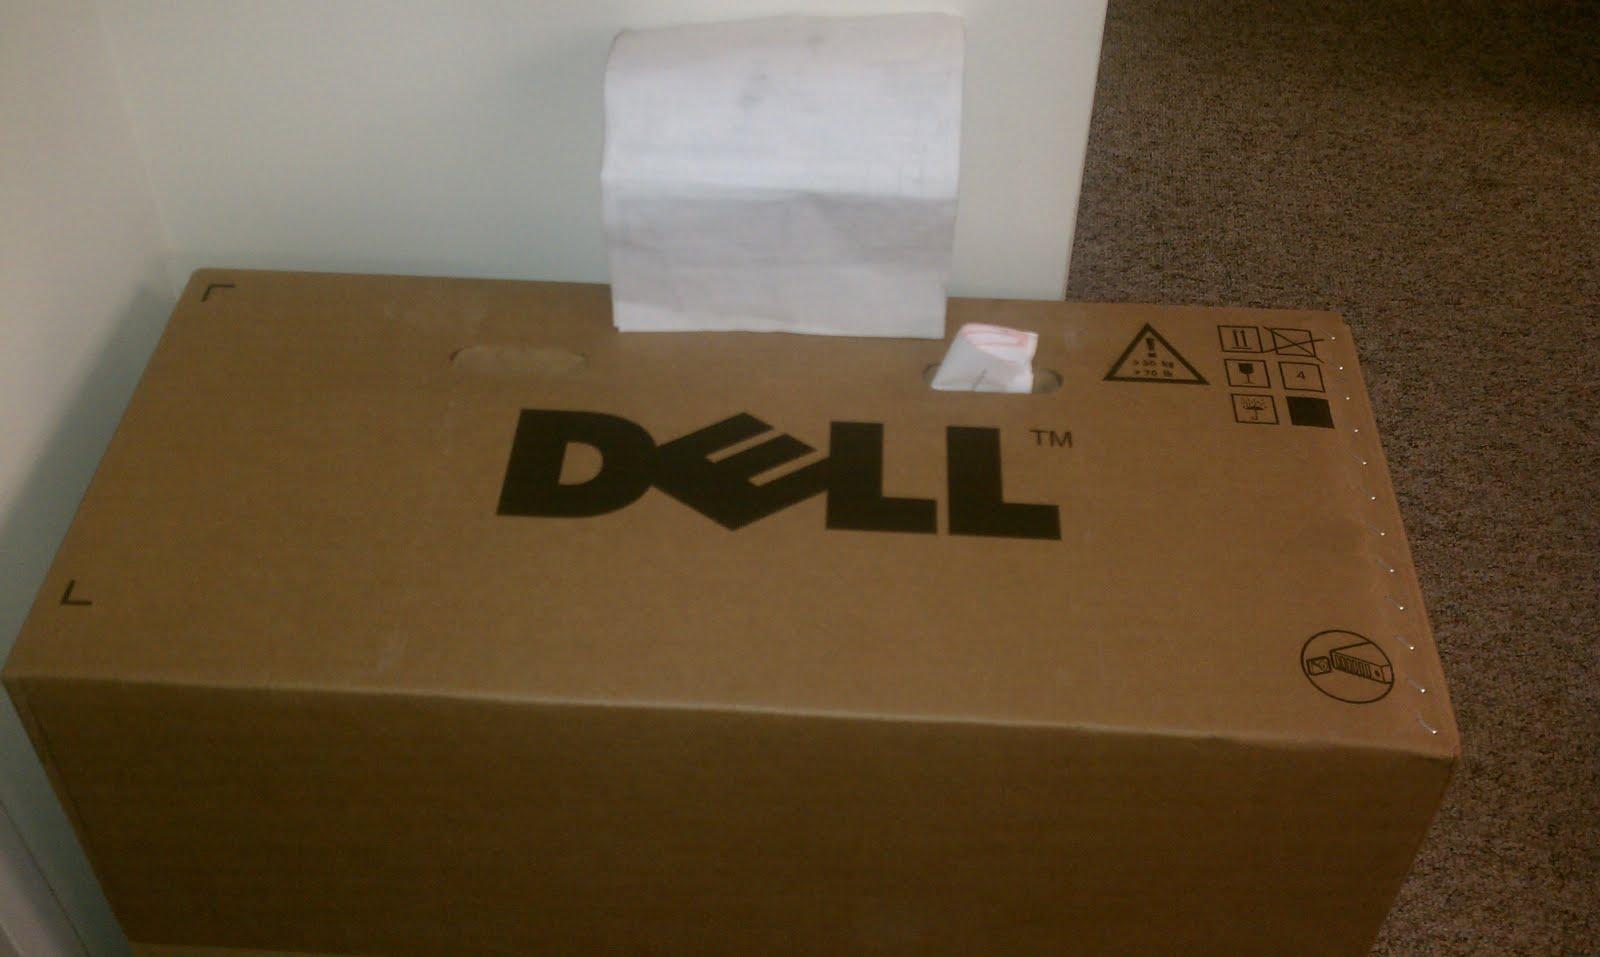 Dell customer service sucks - Home Facebook